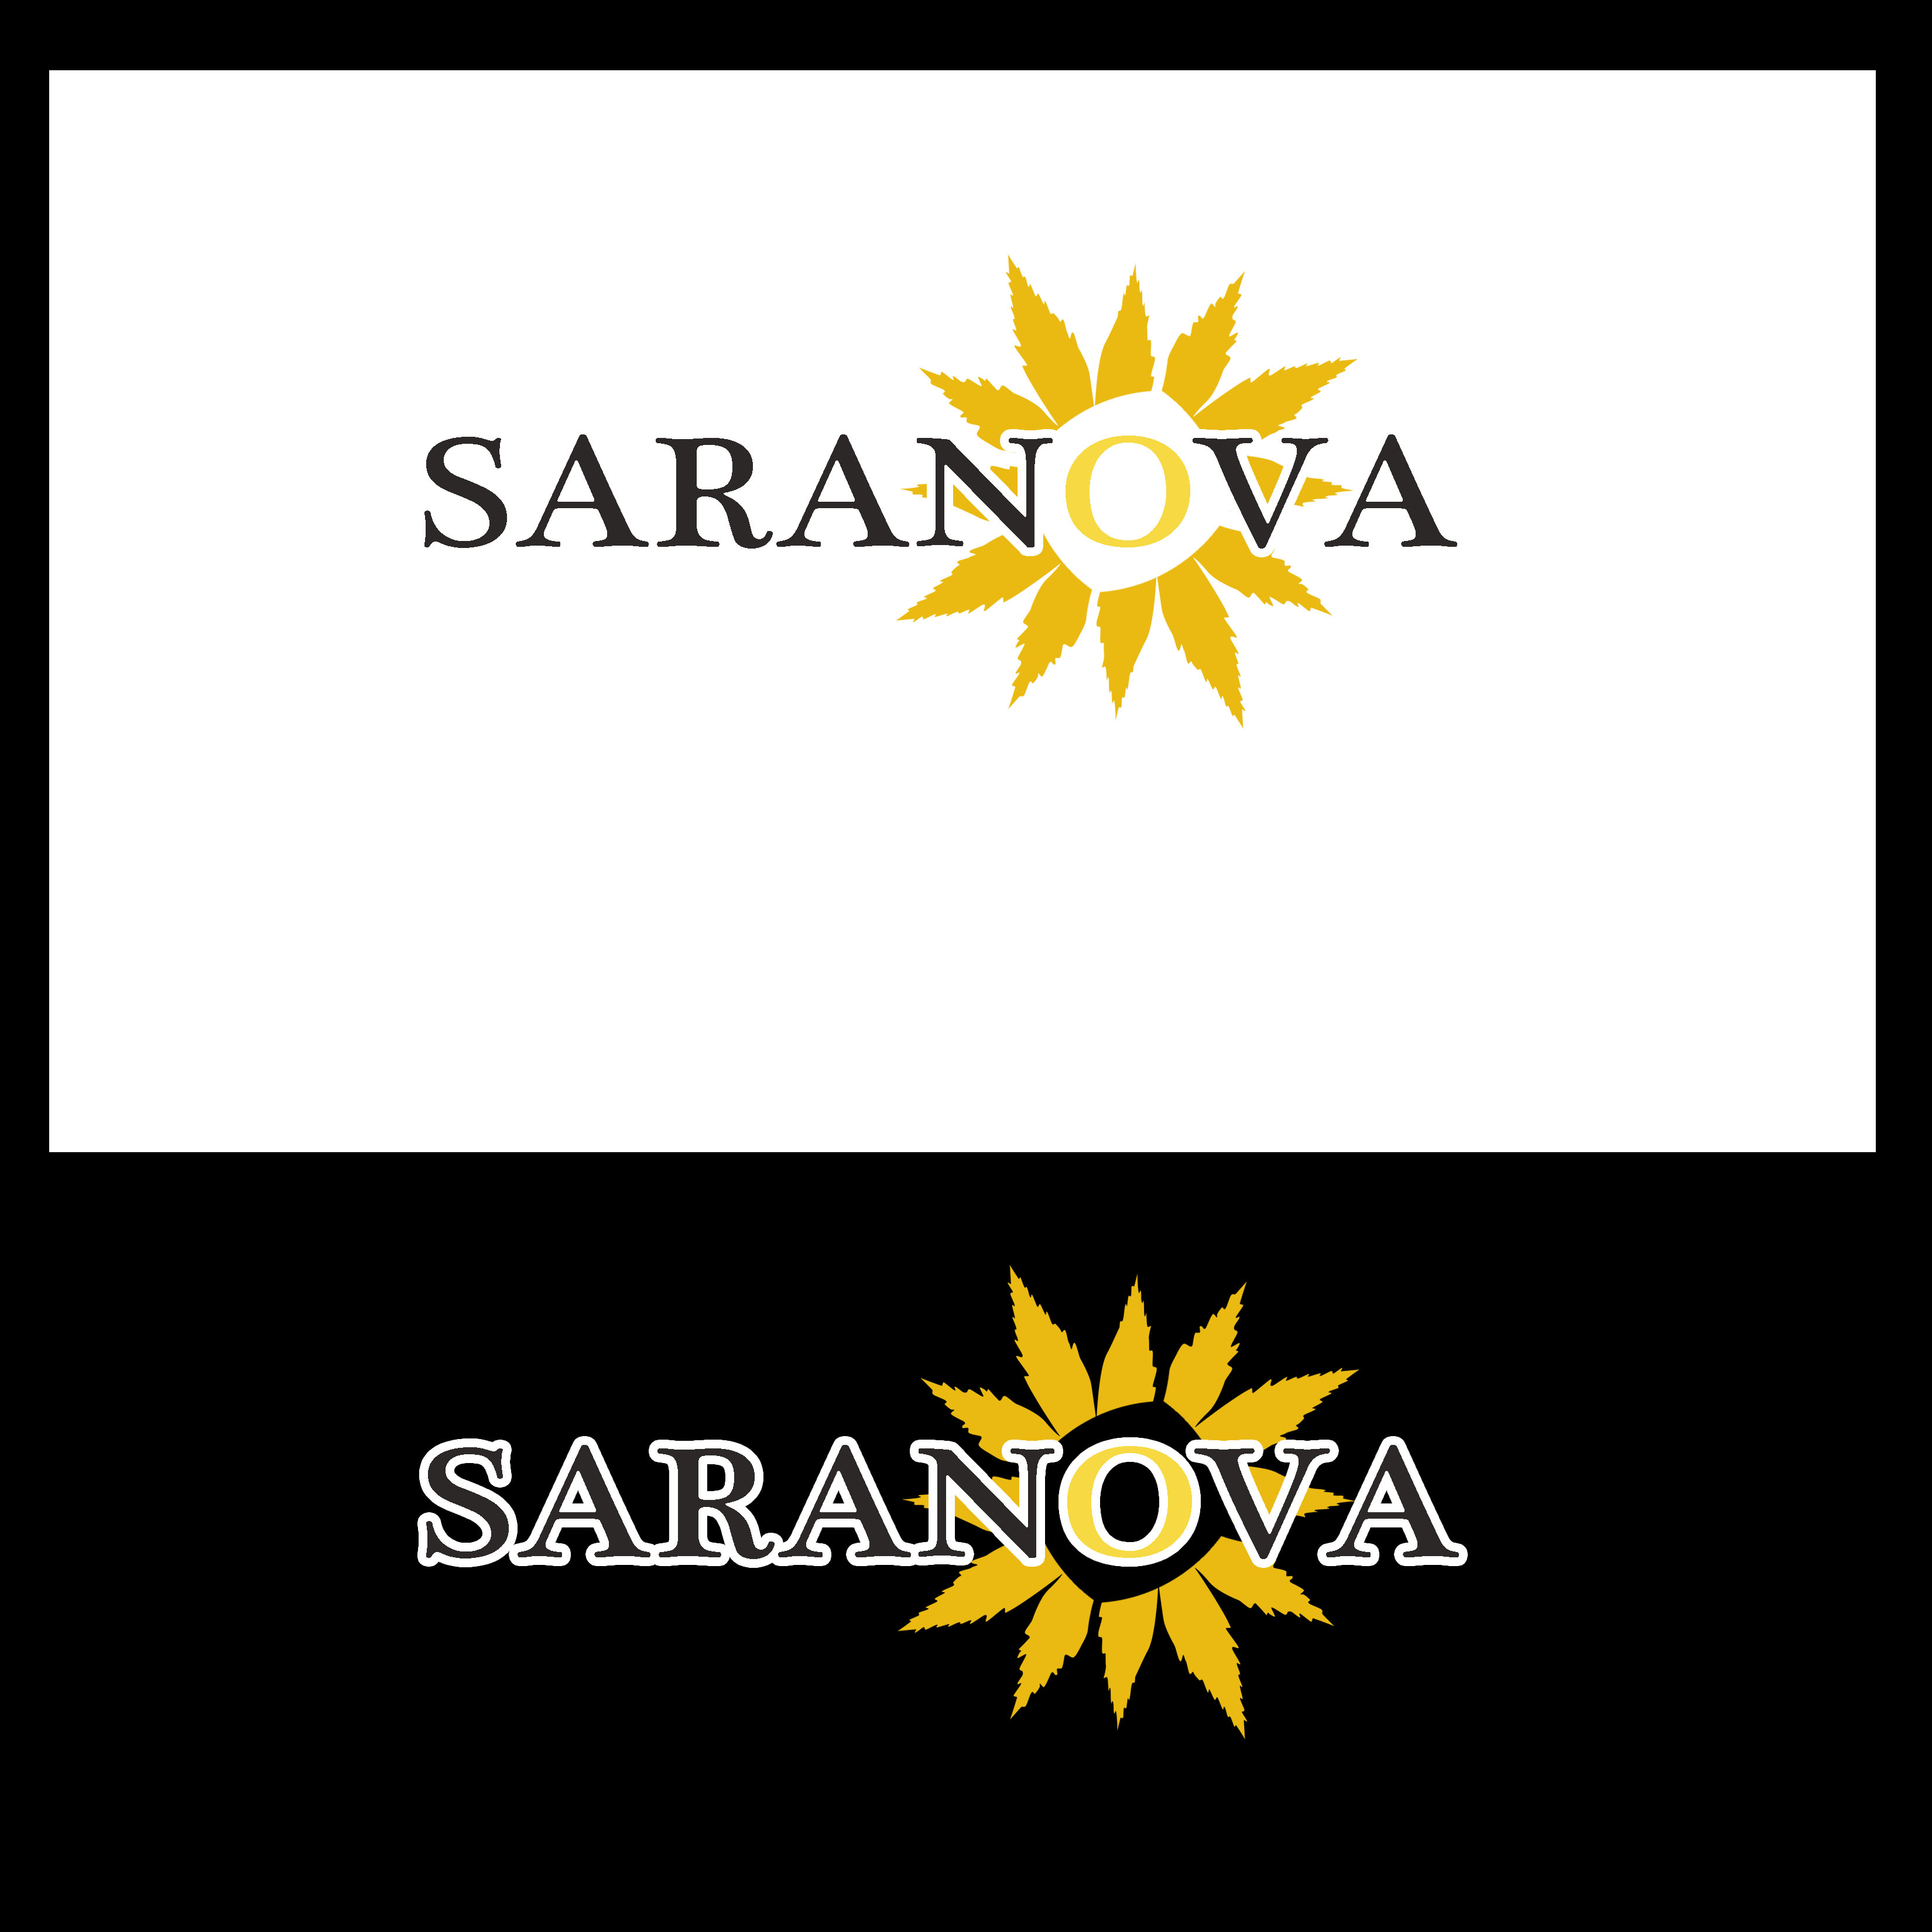 Logo Design by Allan Esclamado - Entry No. 35 in the Logo Design Contest Artistic Logo Design for Saranova.